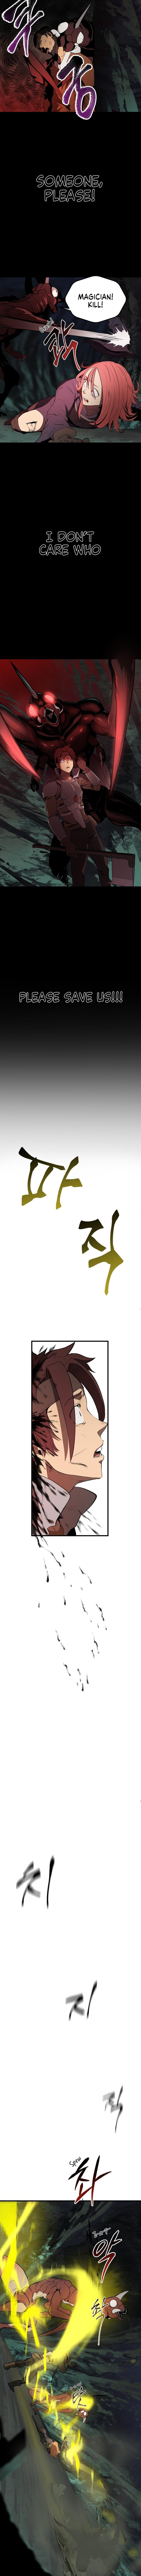 Survival Story Of A Sword King In A Fantasy World Vol.1 Chapter 8 page 5 - Mangakakalots.com